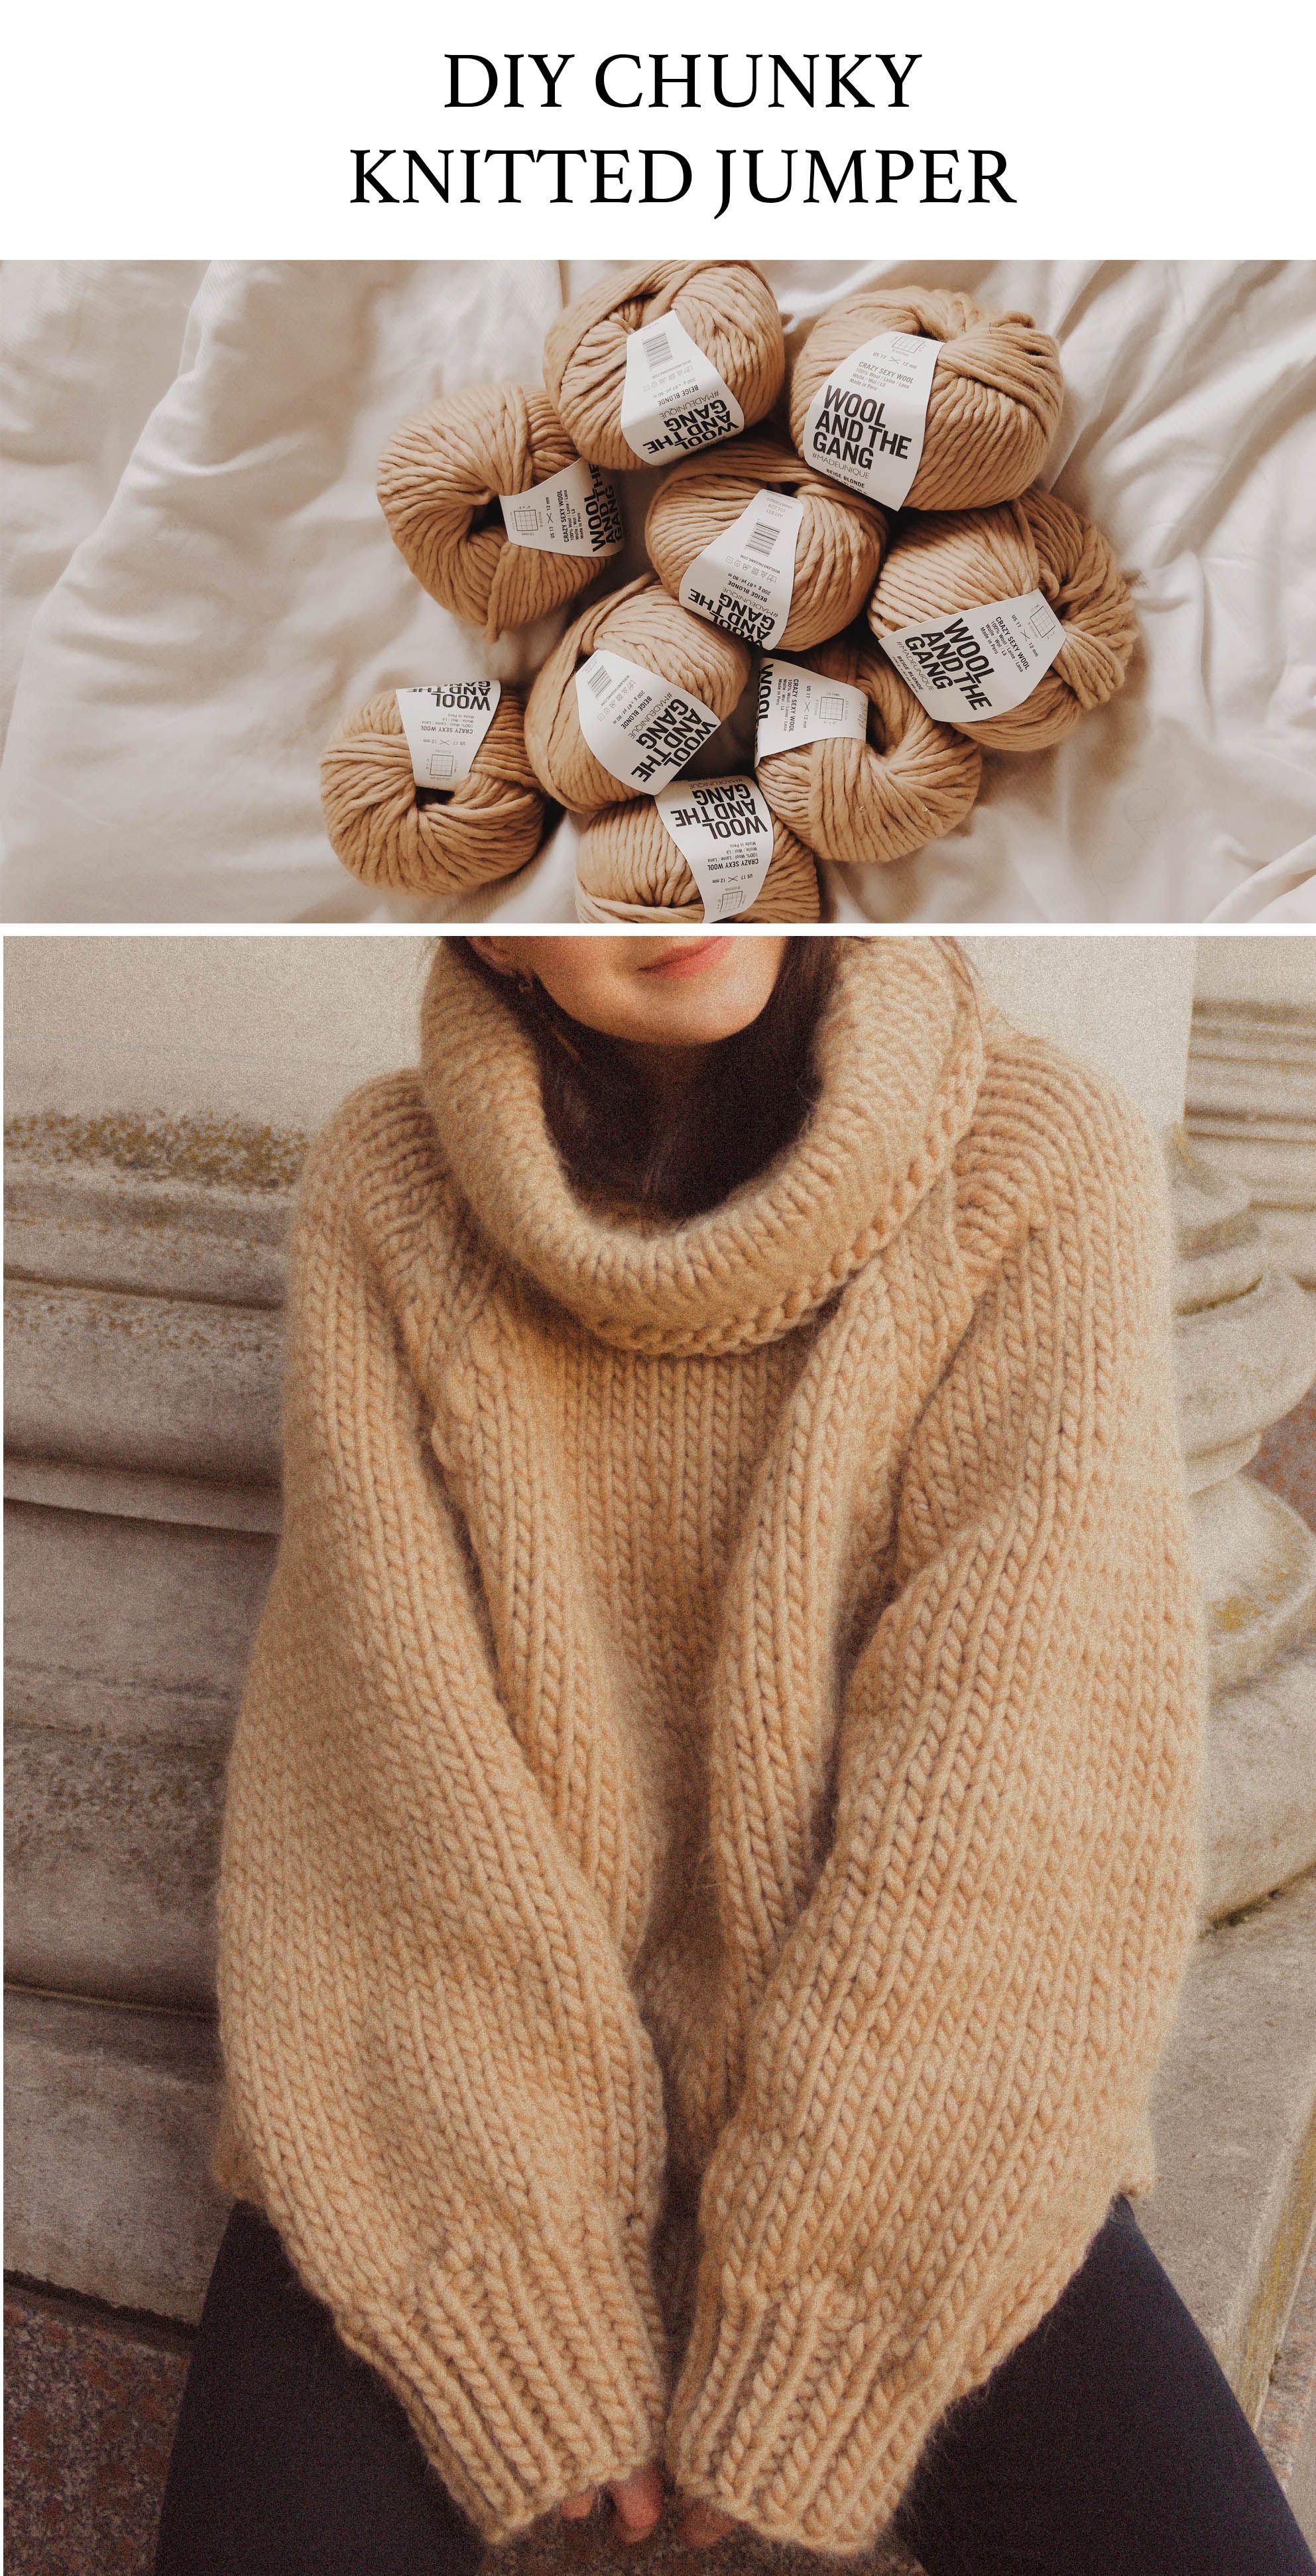 Burn Baby Burn WATG Sweater Self Knitted Kit Wool and the Gang